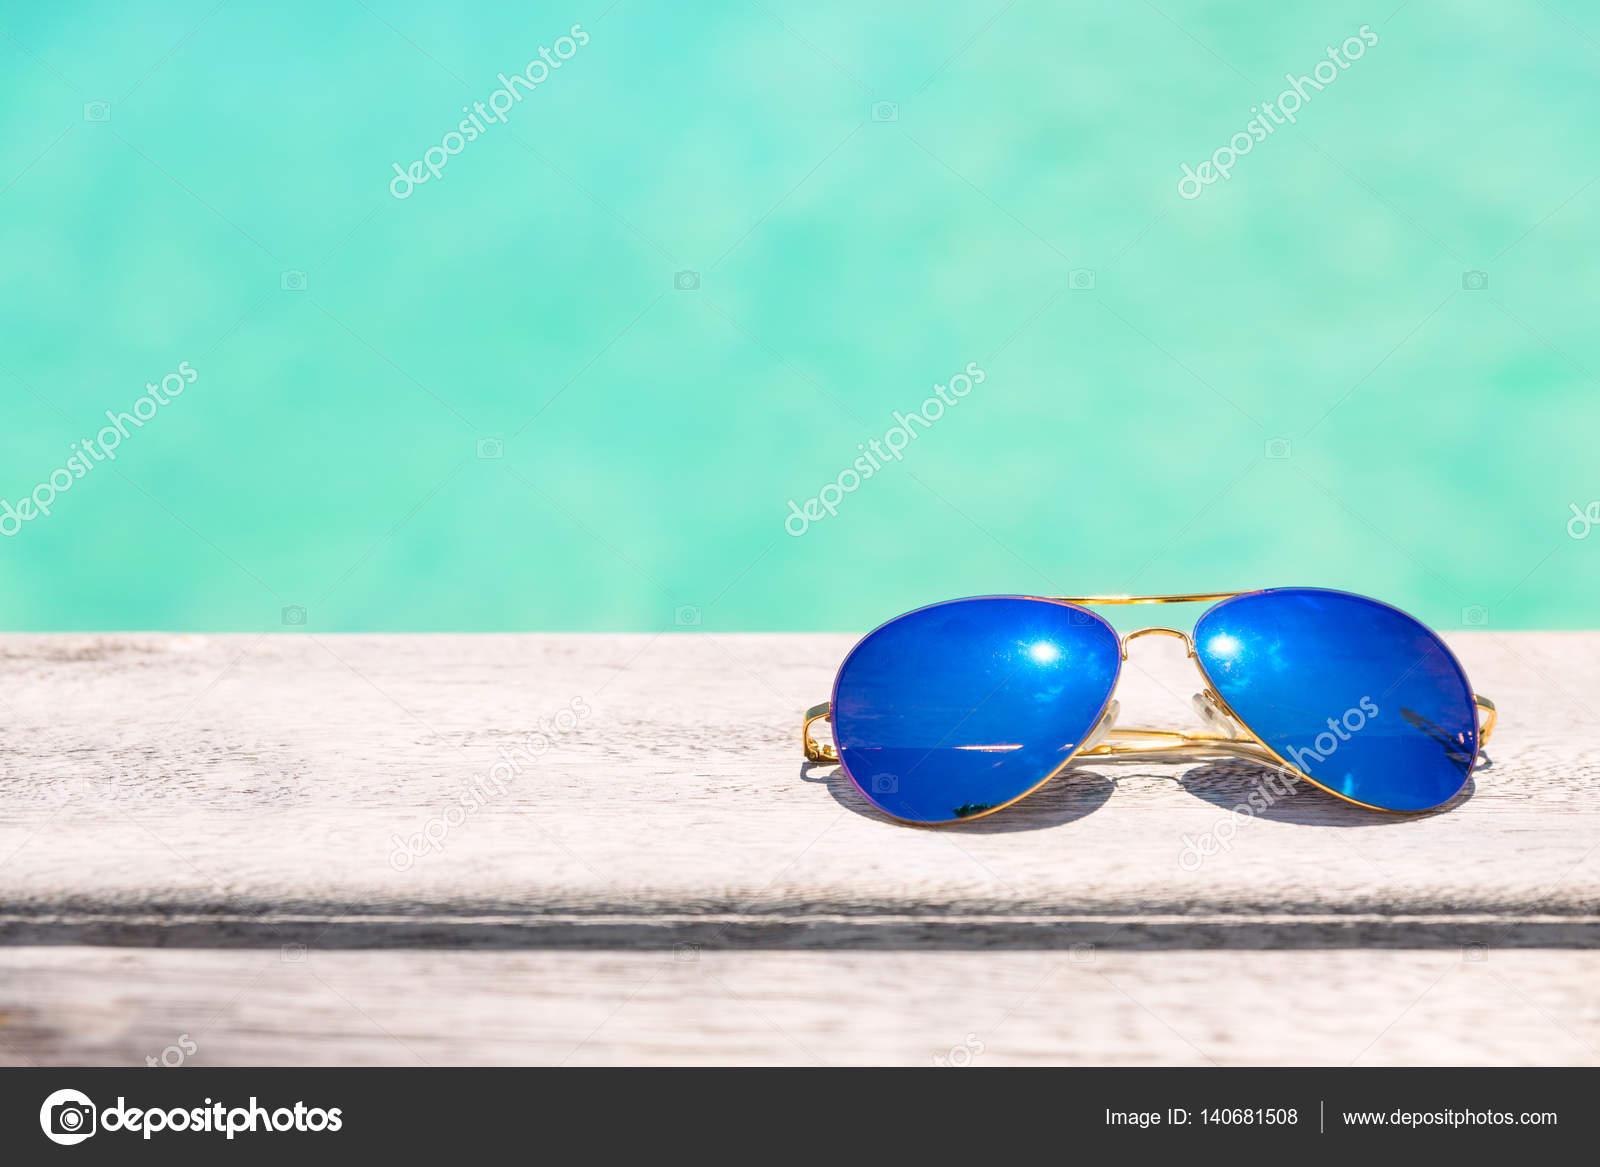 4d5f690f6d Μπλε γυαλιά ηλίου σε ένα ξύλινο κατάστρωμα